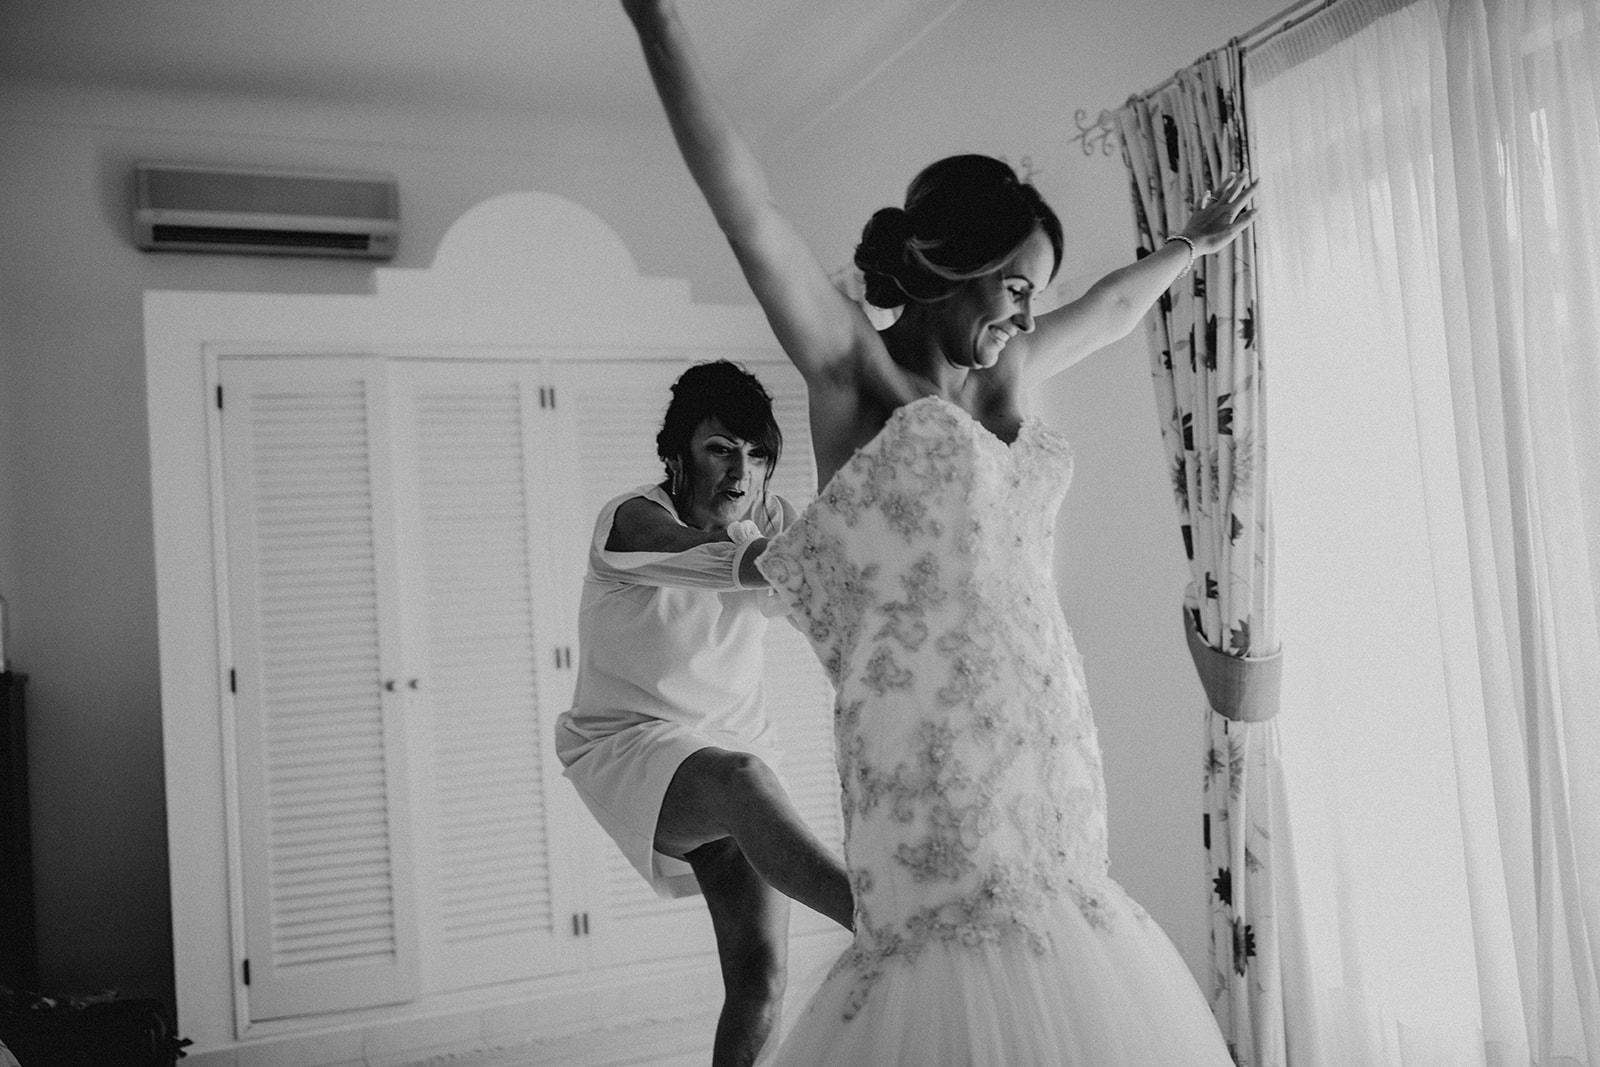 Lapela-photography-wedding-algarve-portugal-best-of-21.jpg